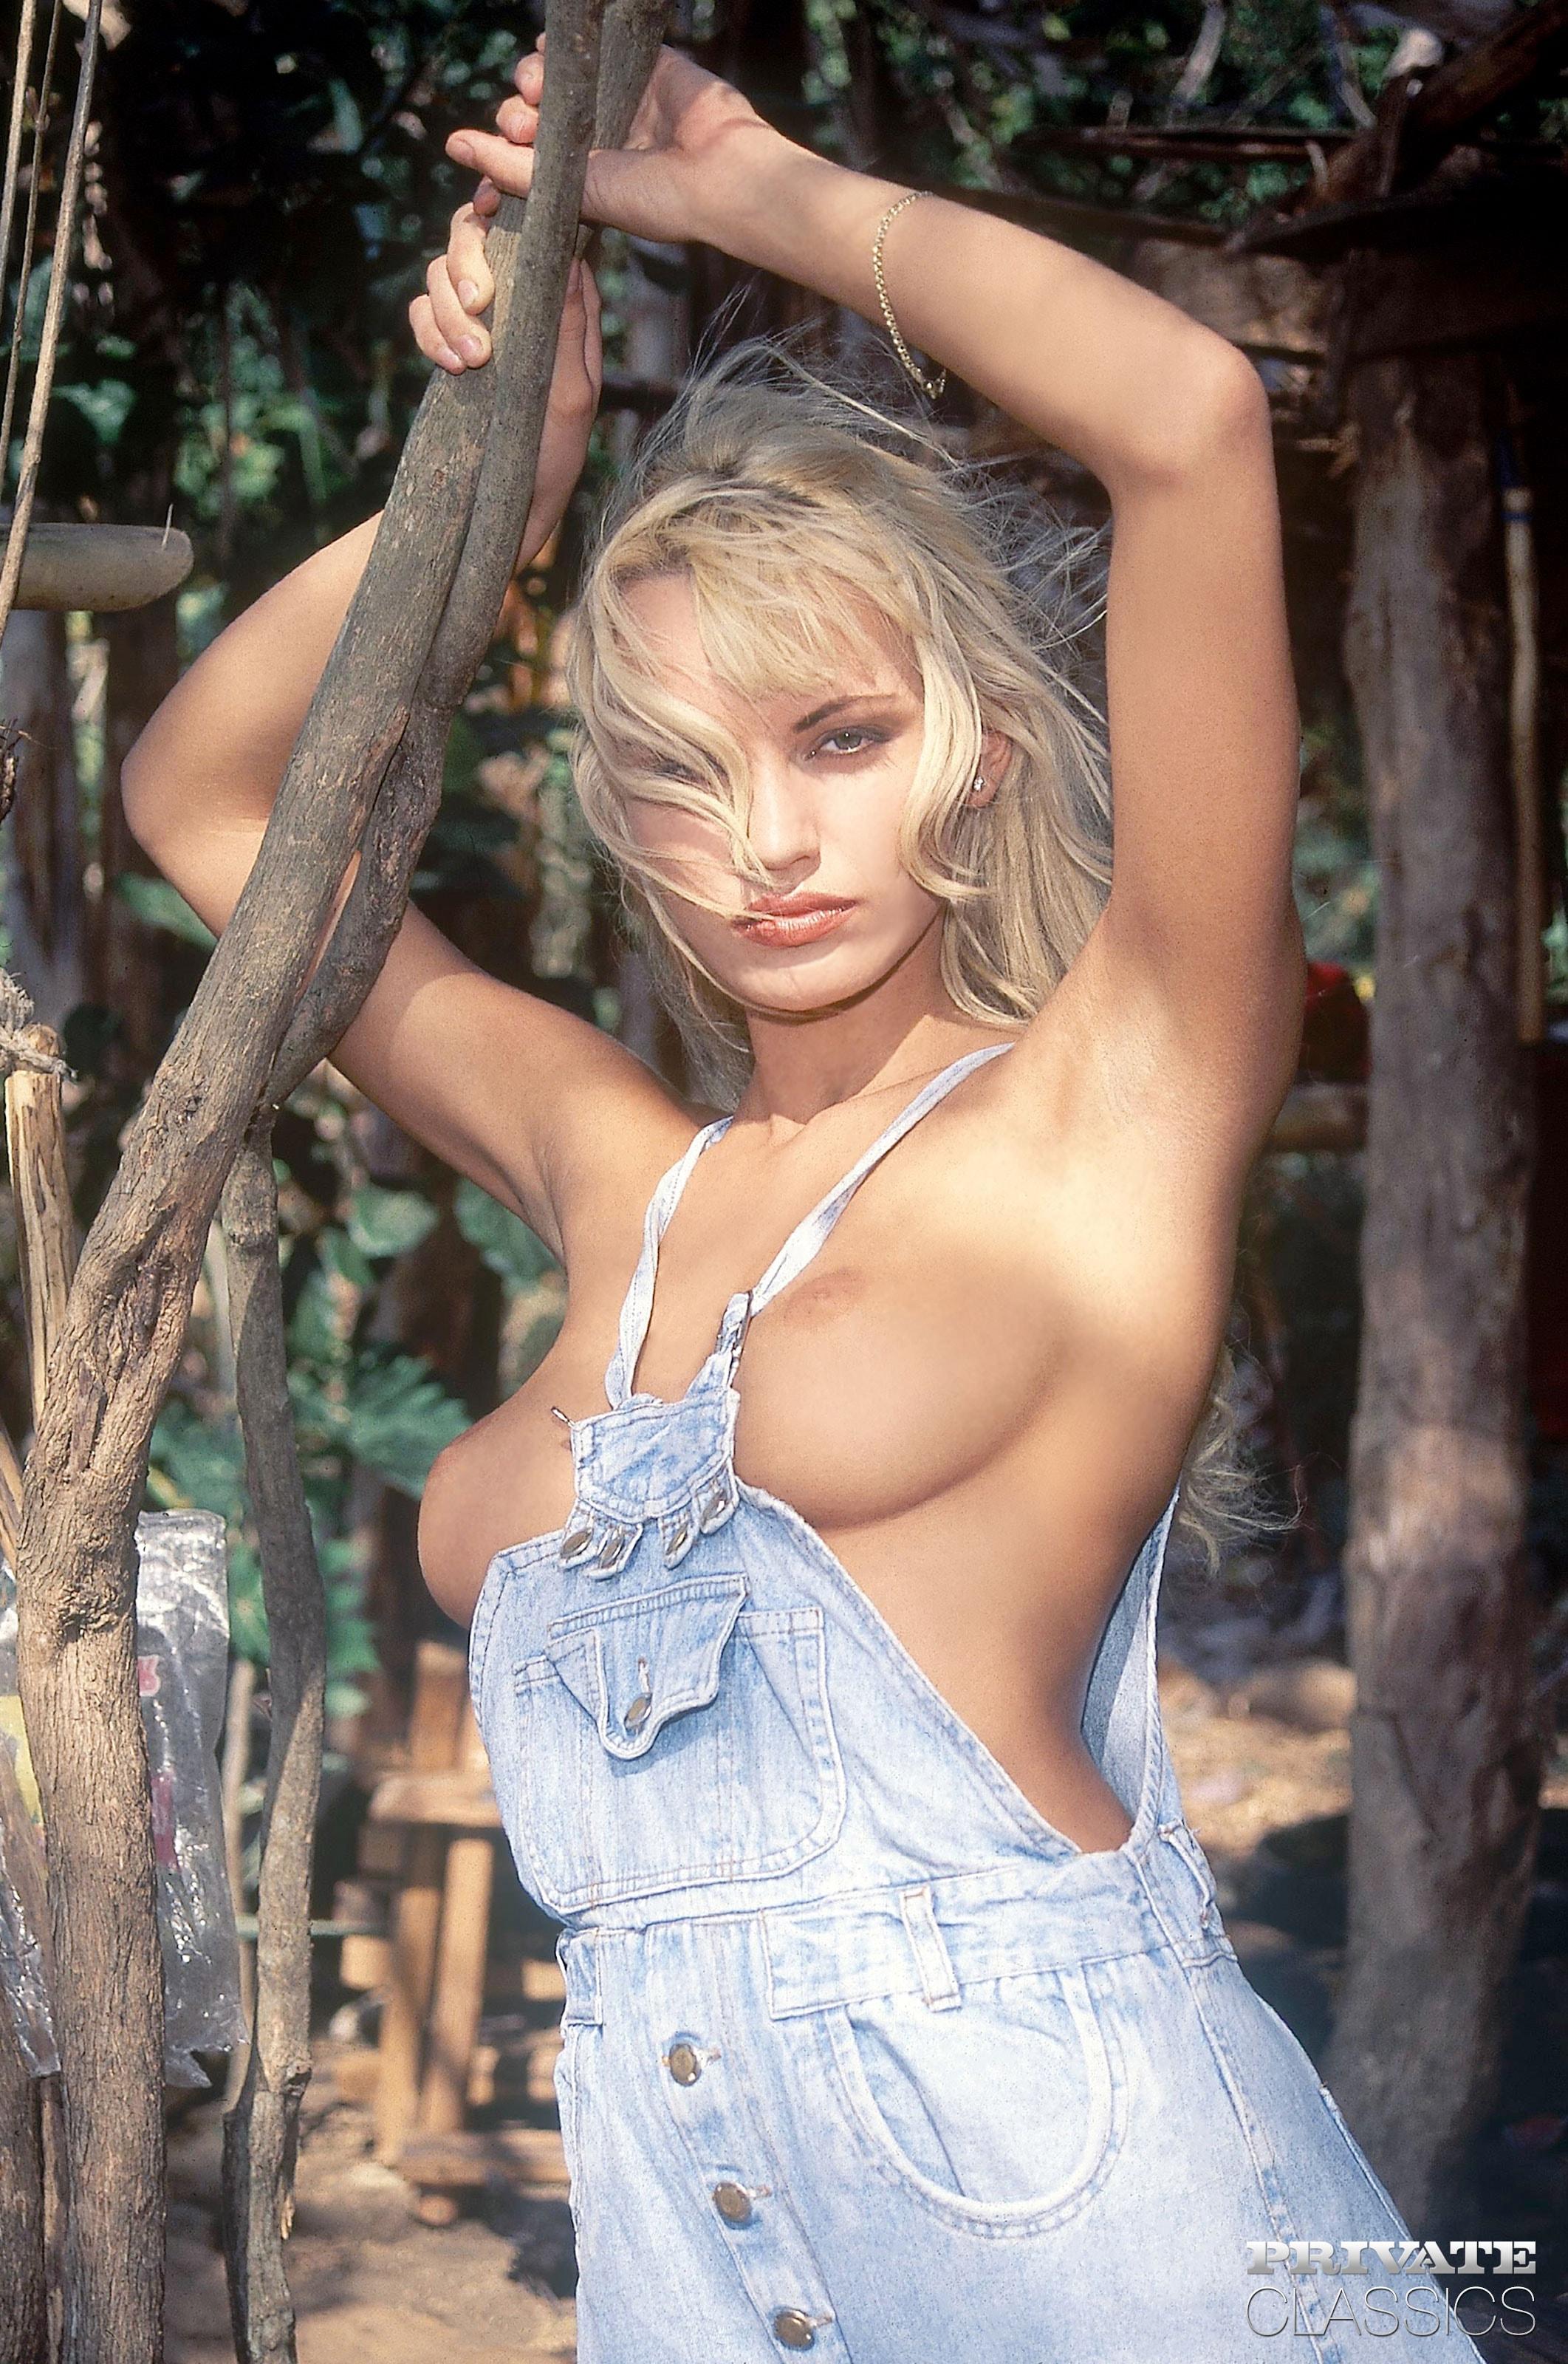 Curious Anita blonde nude Really strange